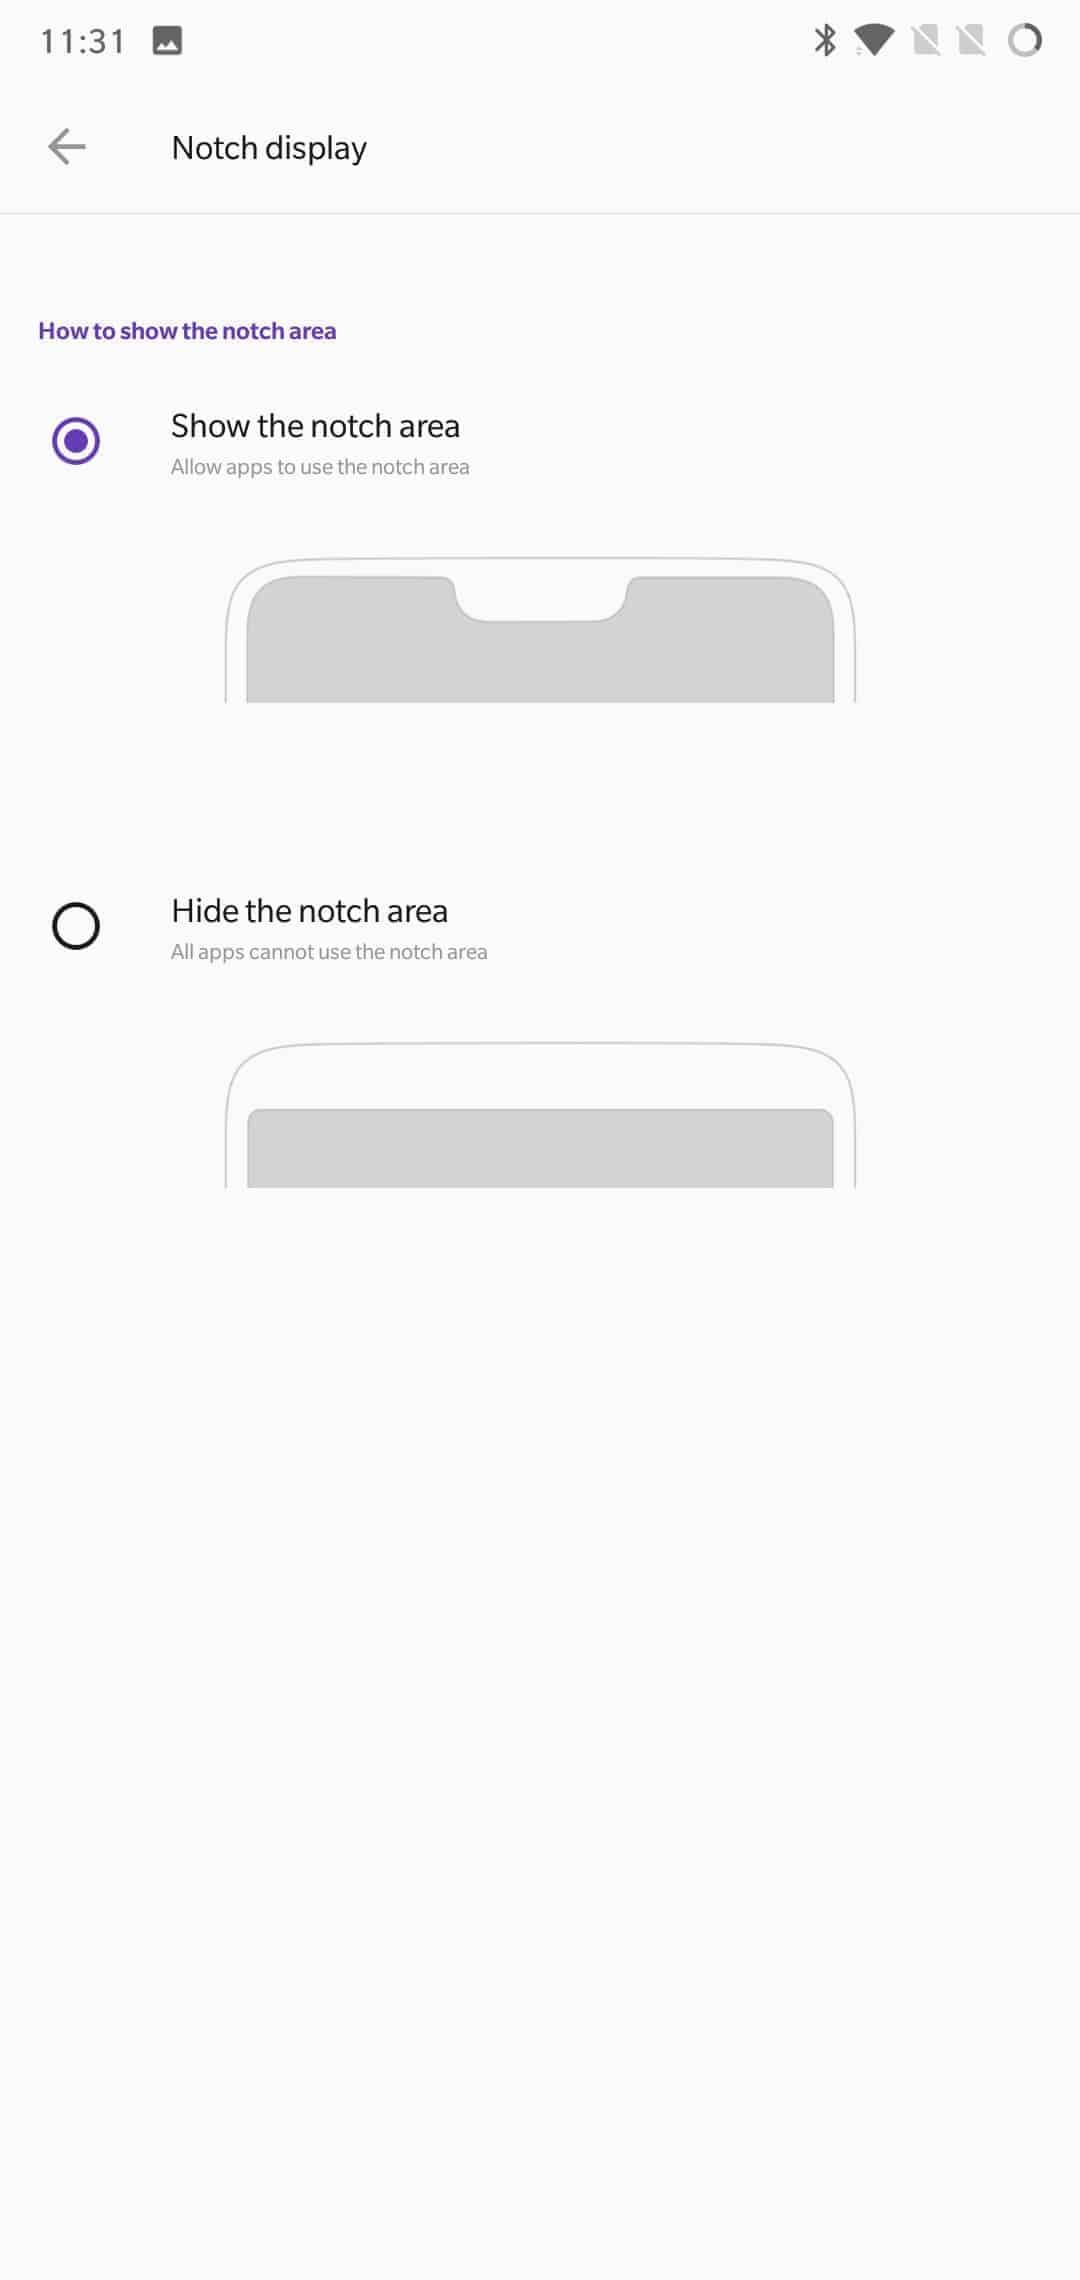 OnePlus 6 AH NS Screenshots display 3 notch